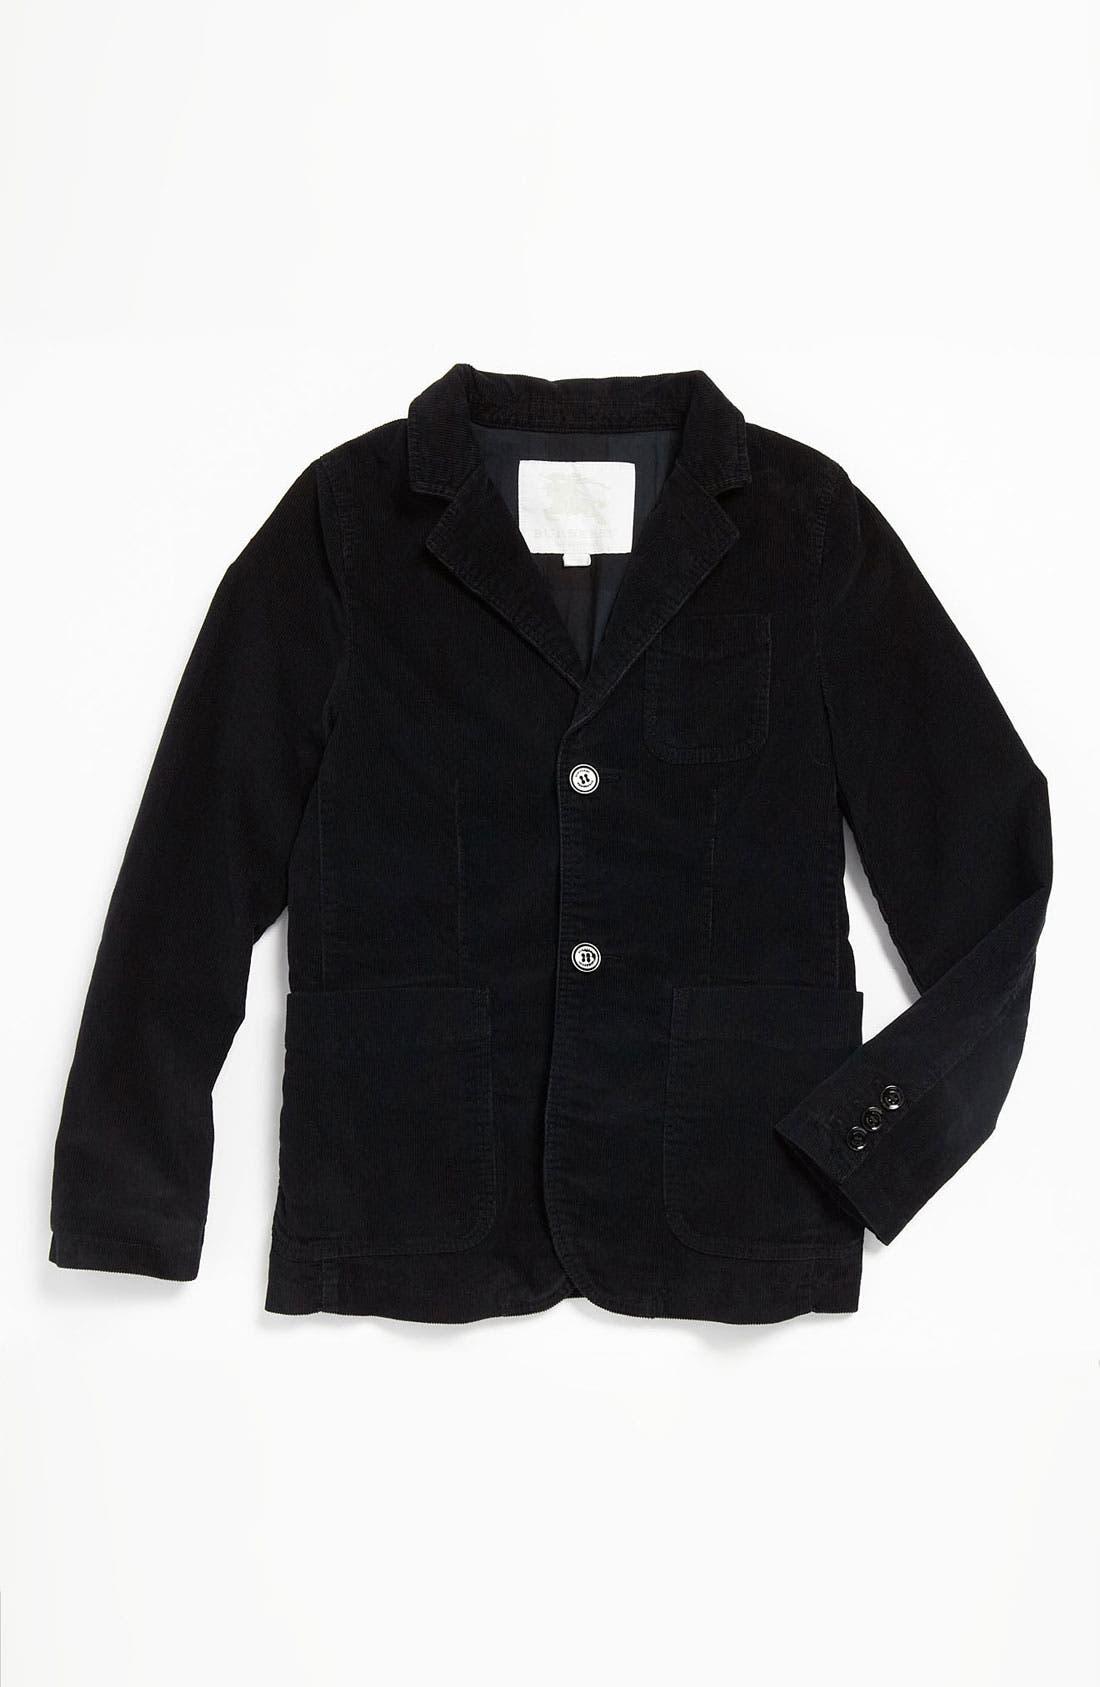 Main Image - Burberry Tailored Corduroy Jacket (Big Boys)